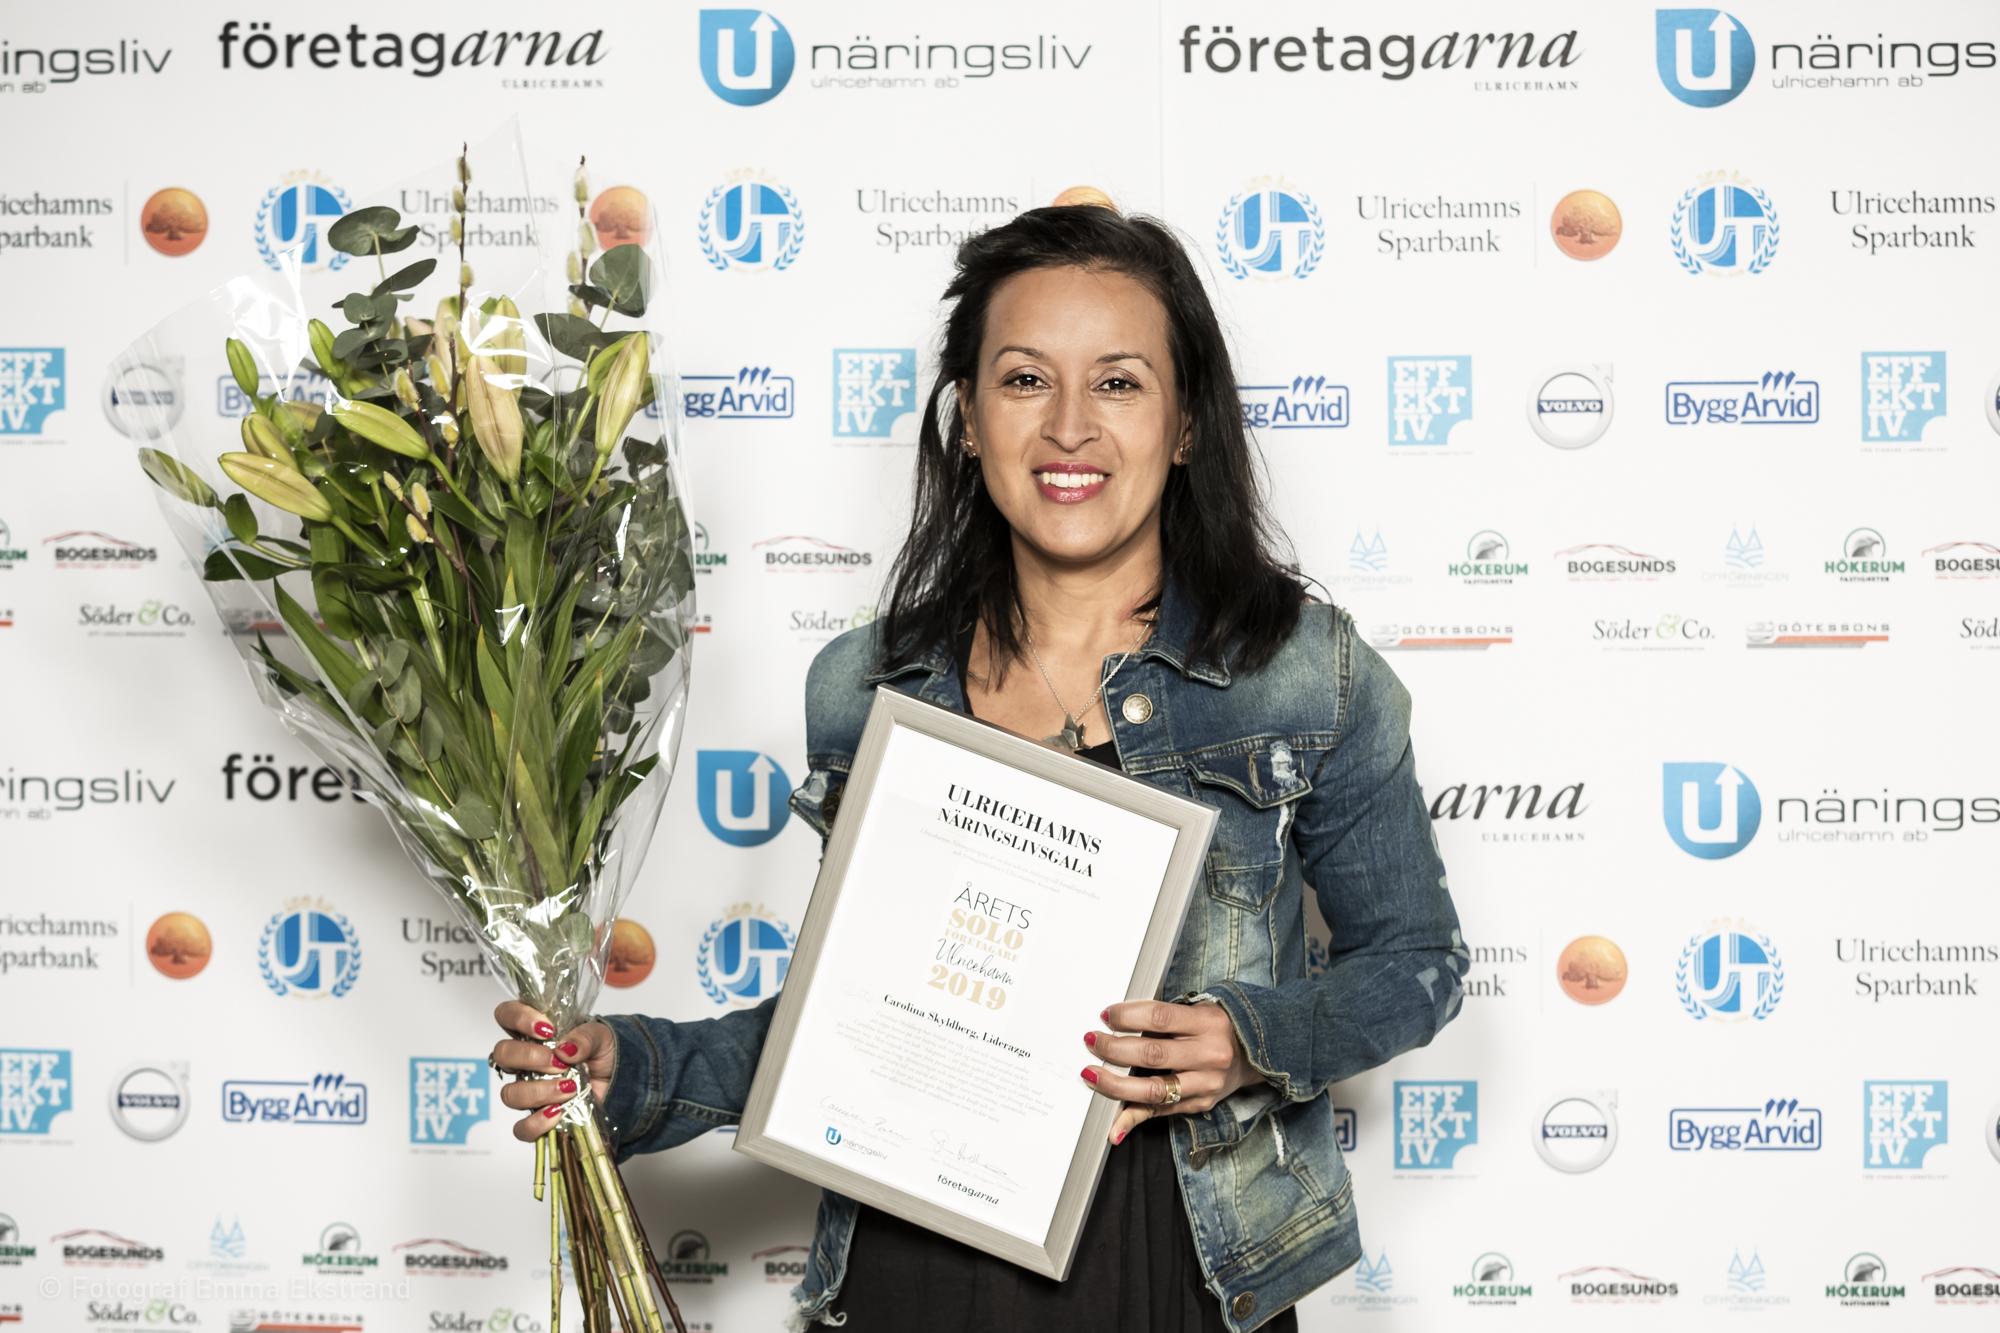 Årets Soloföretagare 2019 - Carolina Skyldberg, Liderazgo